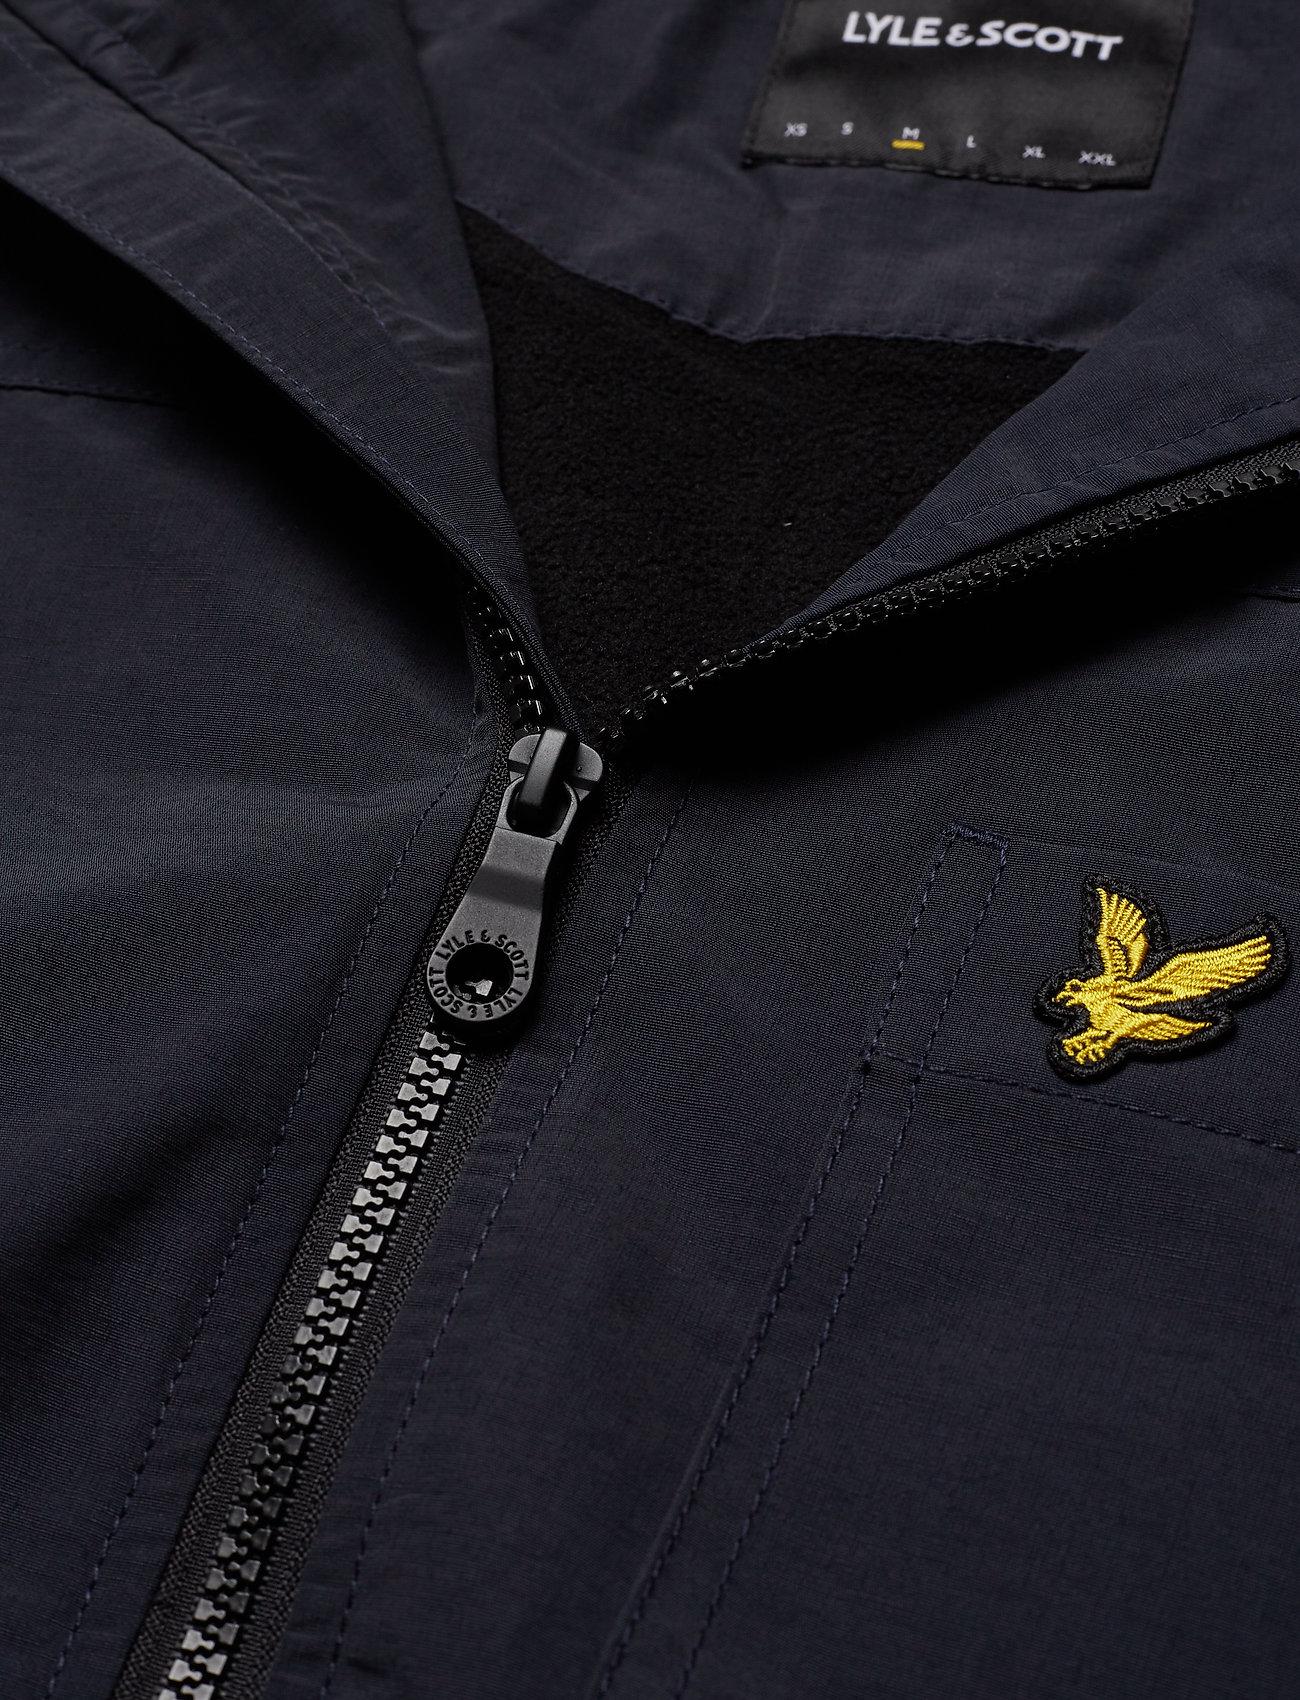 Lined Scott Micro NavyLyleamp; Jacketdark Fleece zSUGpqMV